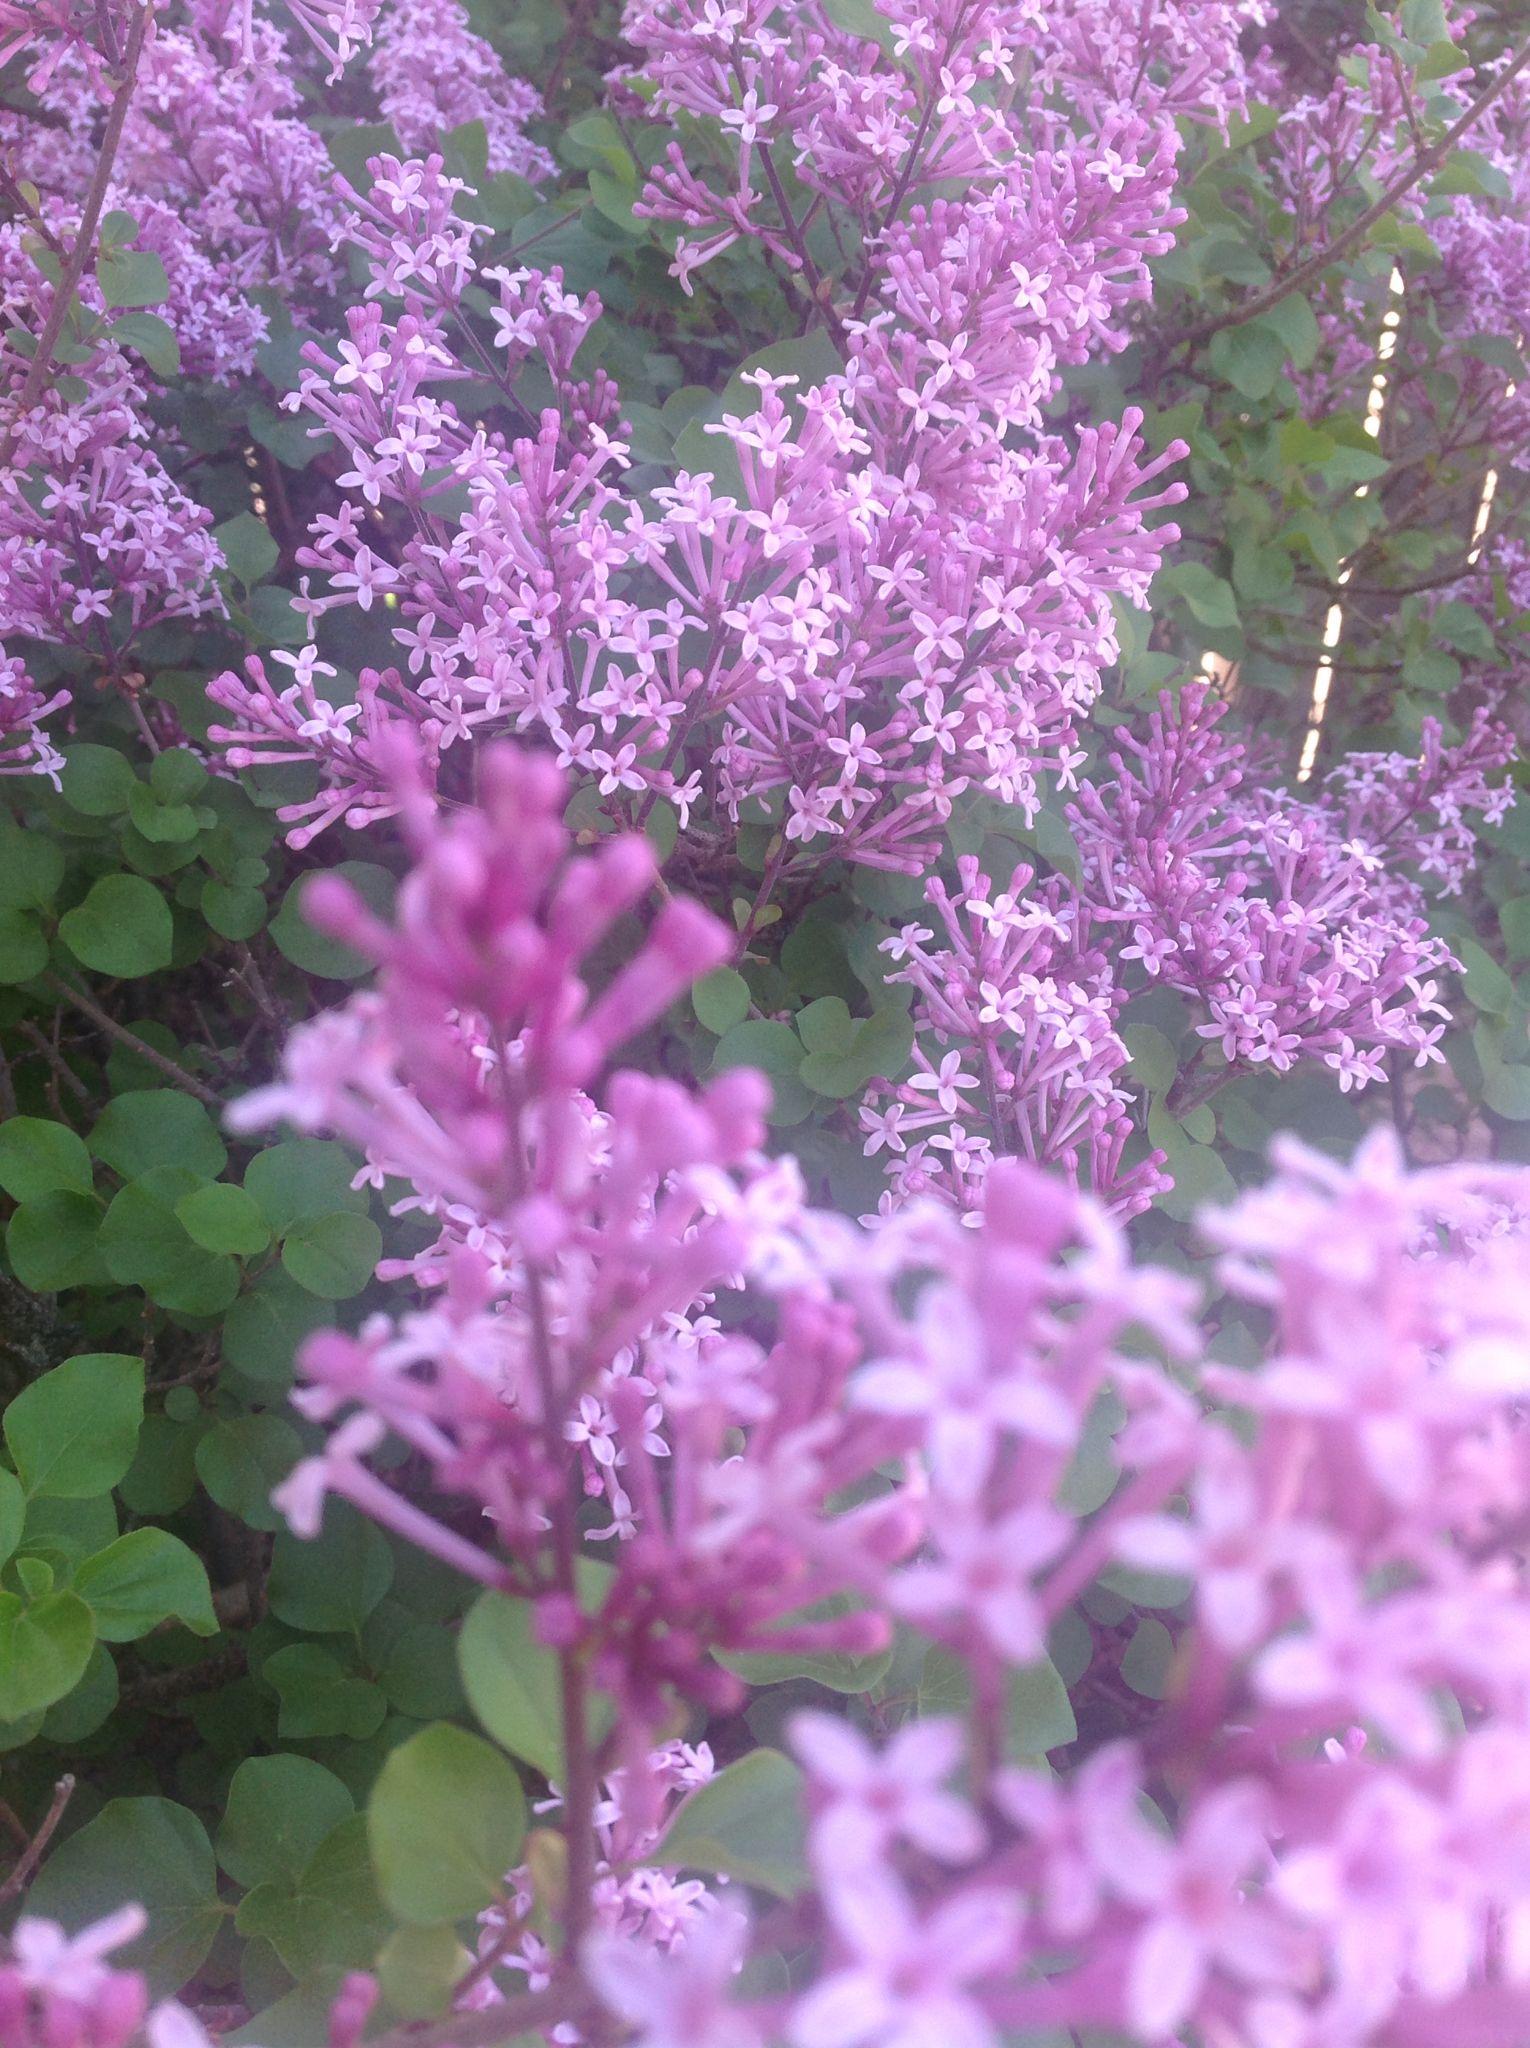 This beauty is a Dwarf Korean Lilac bush. Stunningly ...